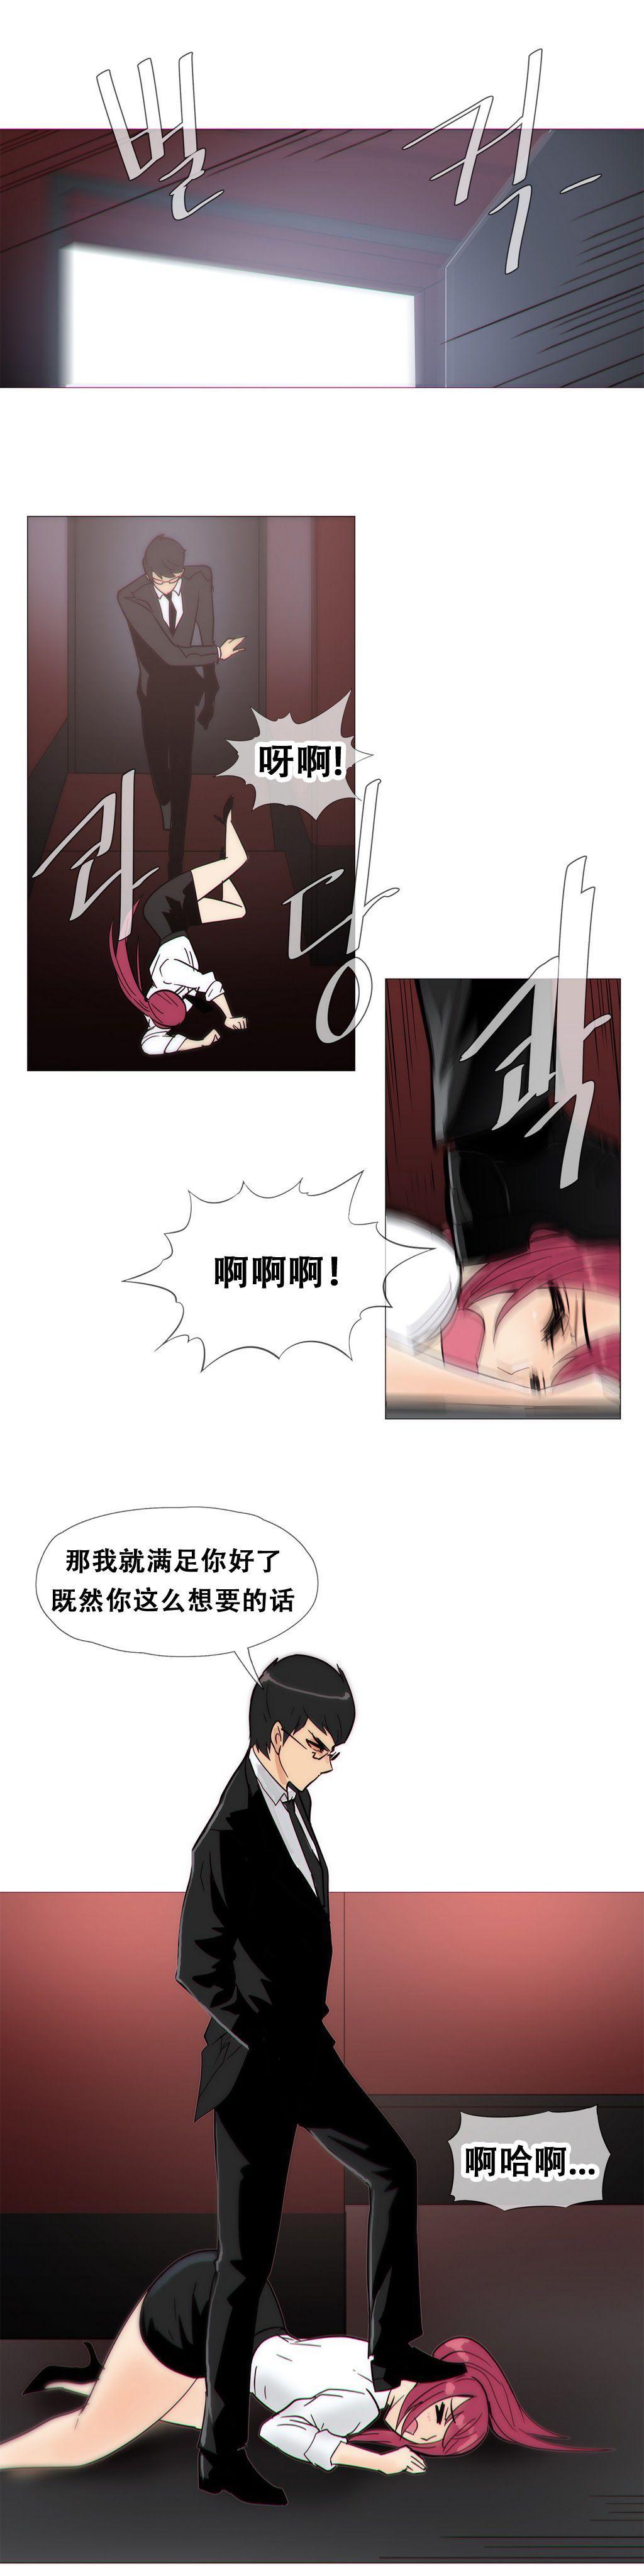 HouseHold Affairs 【卞赤鲤个人汉化】1~33话(持续更新中) 315